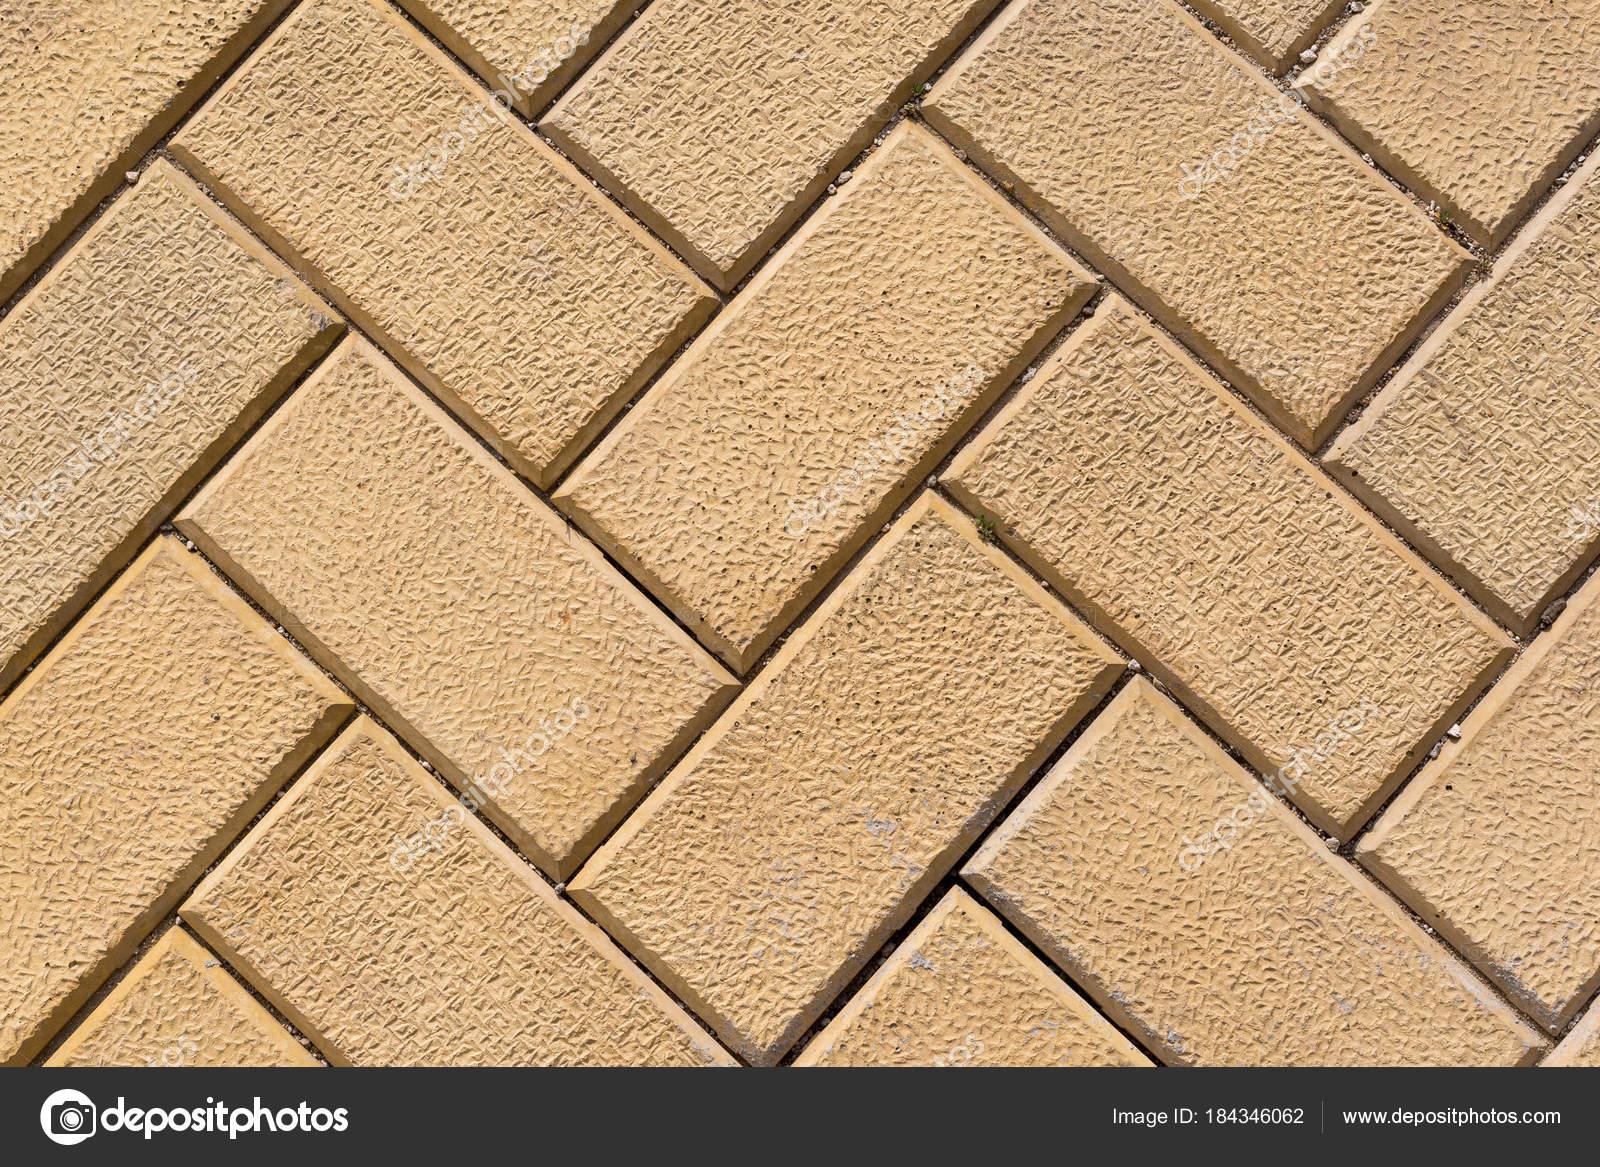 Texture sfondo e pavimento in cotto u2014 foto stock © jonny slav